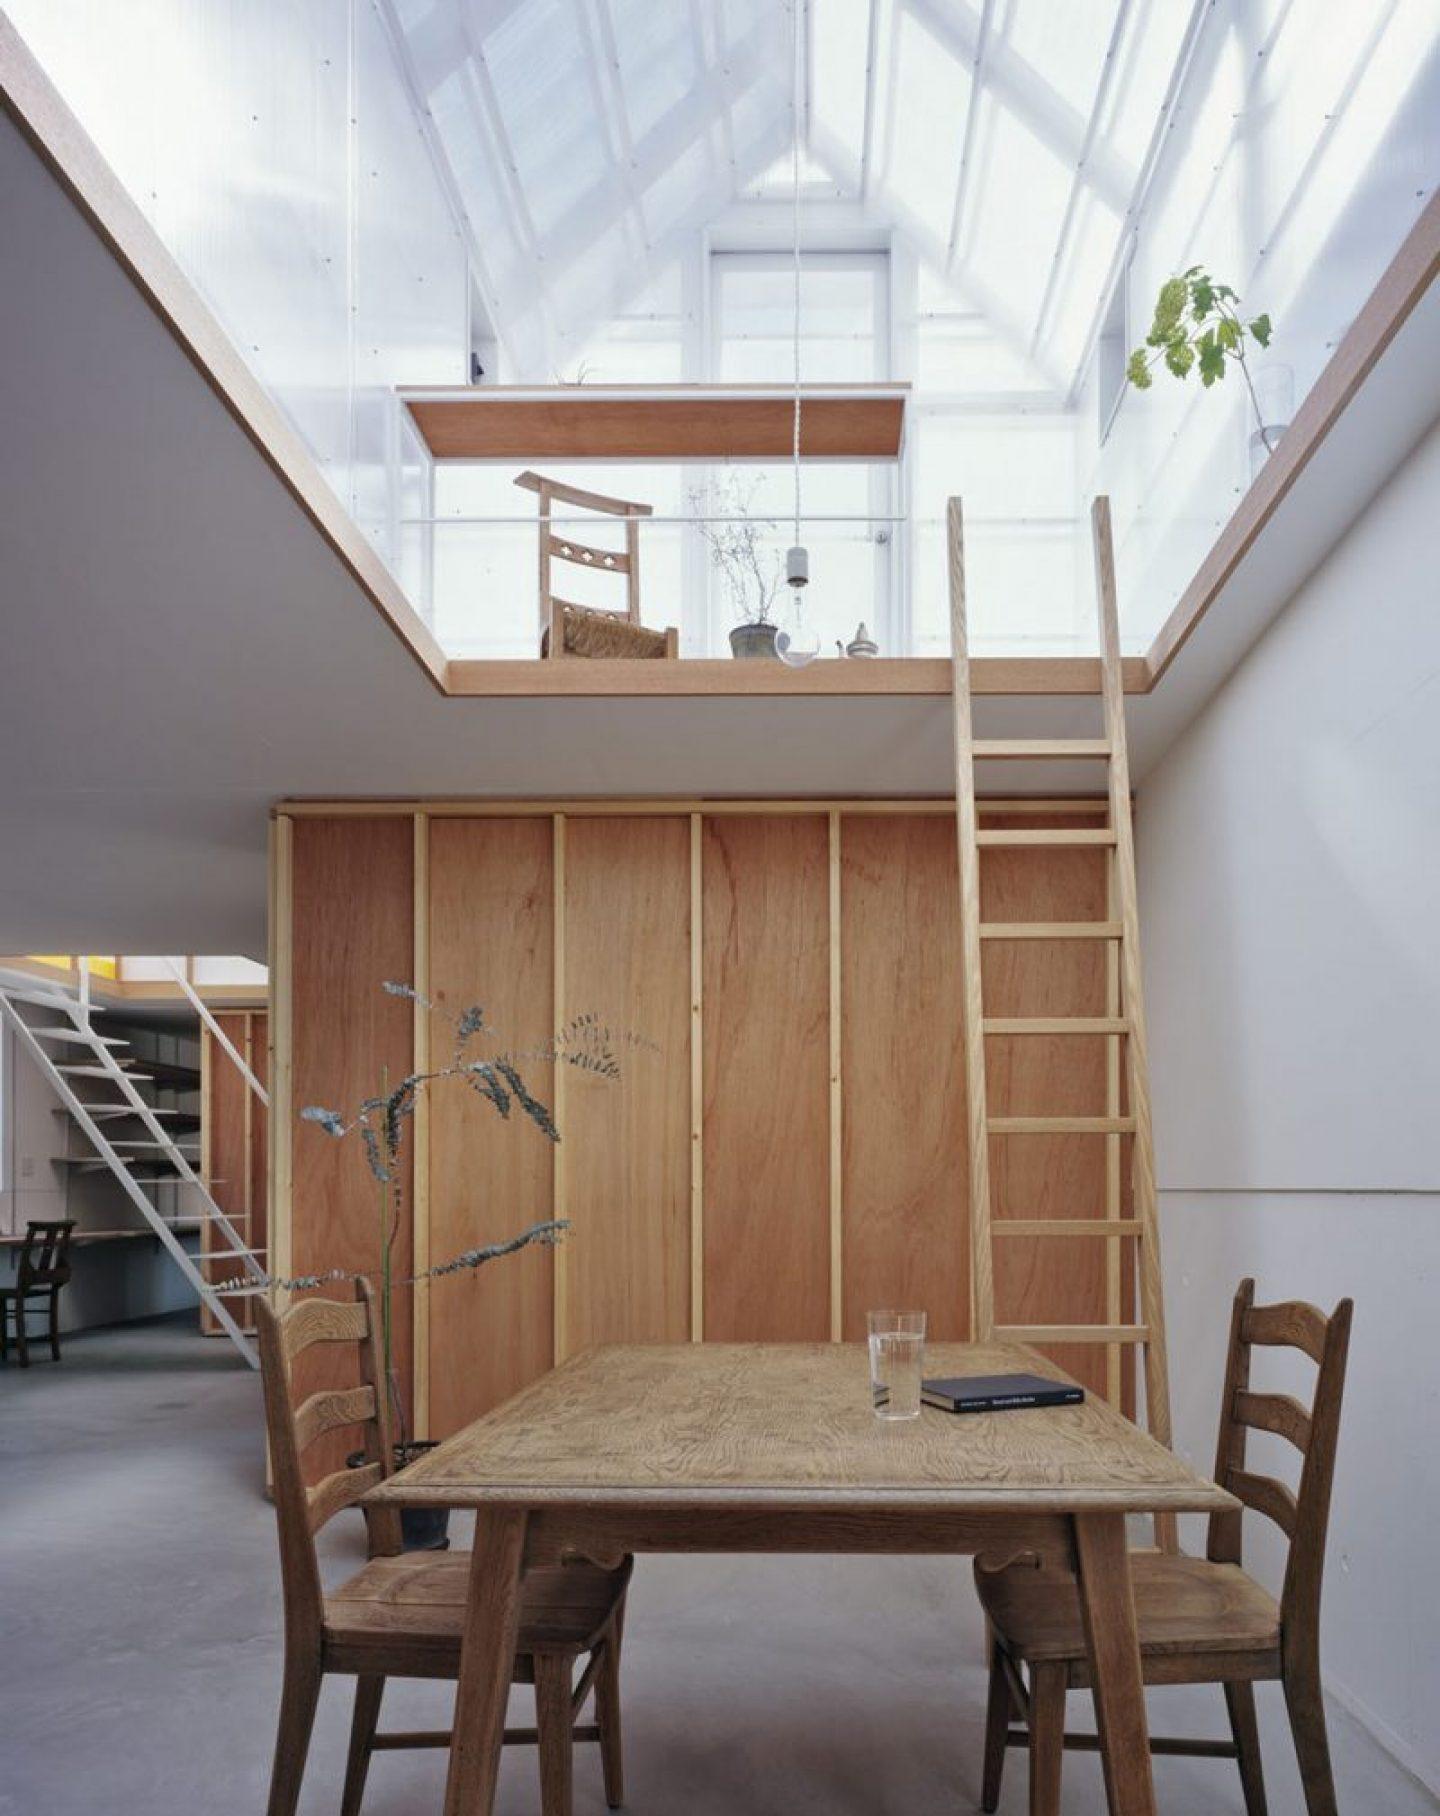 iGNANT_Architecture_Tato_Architects_Yo_Shimada_House_In_Yamasaki_15